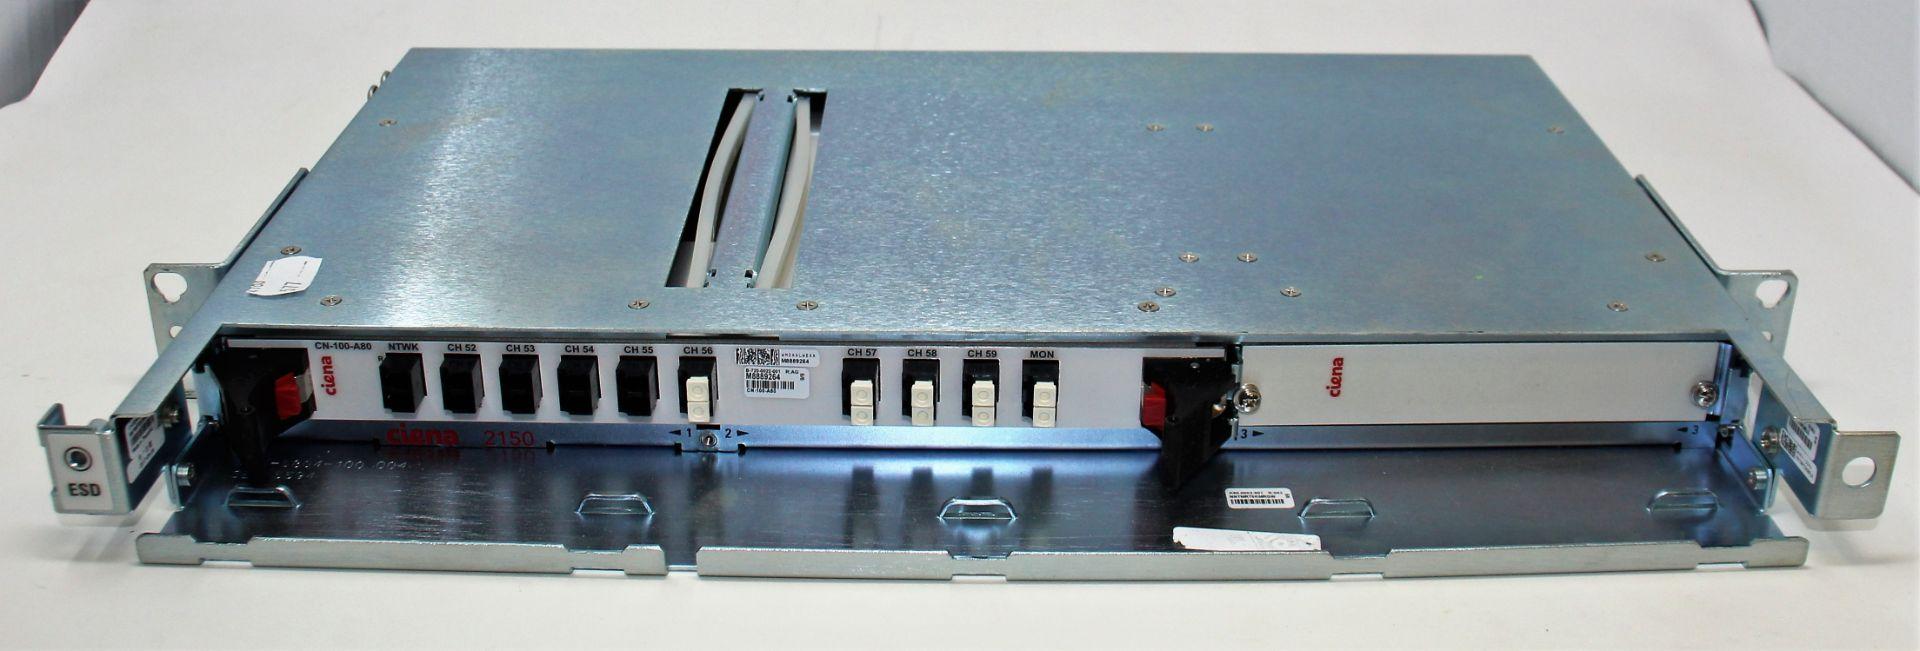 A pre-owned Ciena CN-100-A80 B-720-0022-001 WM0AALWEAA M8889264 DWDM Module (Untested, sold as